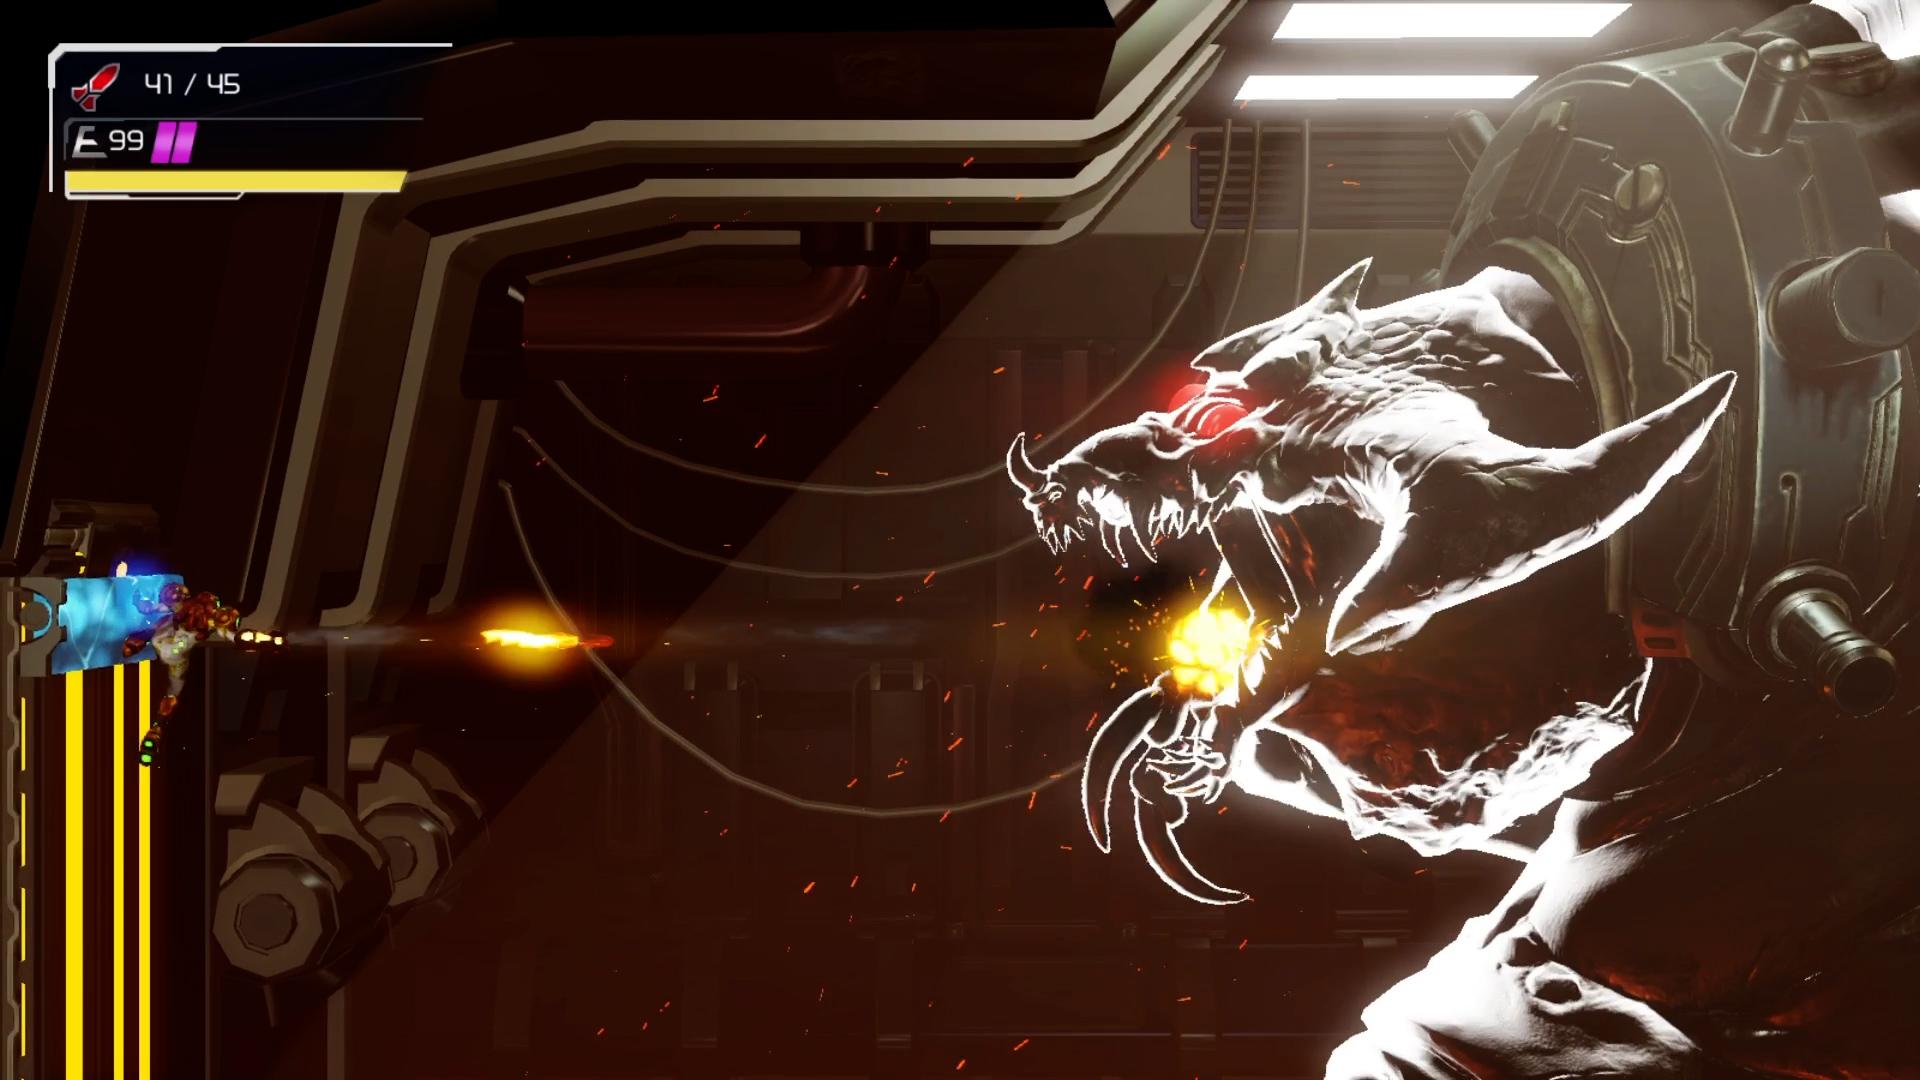 metroid dread second boss fight guide kraid